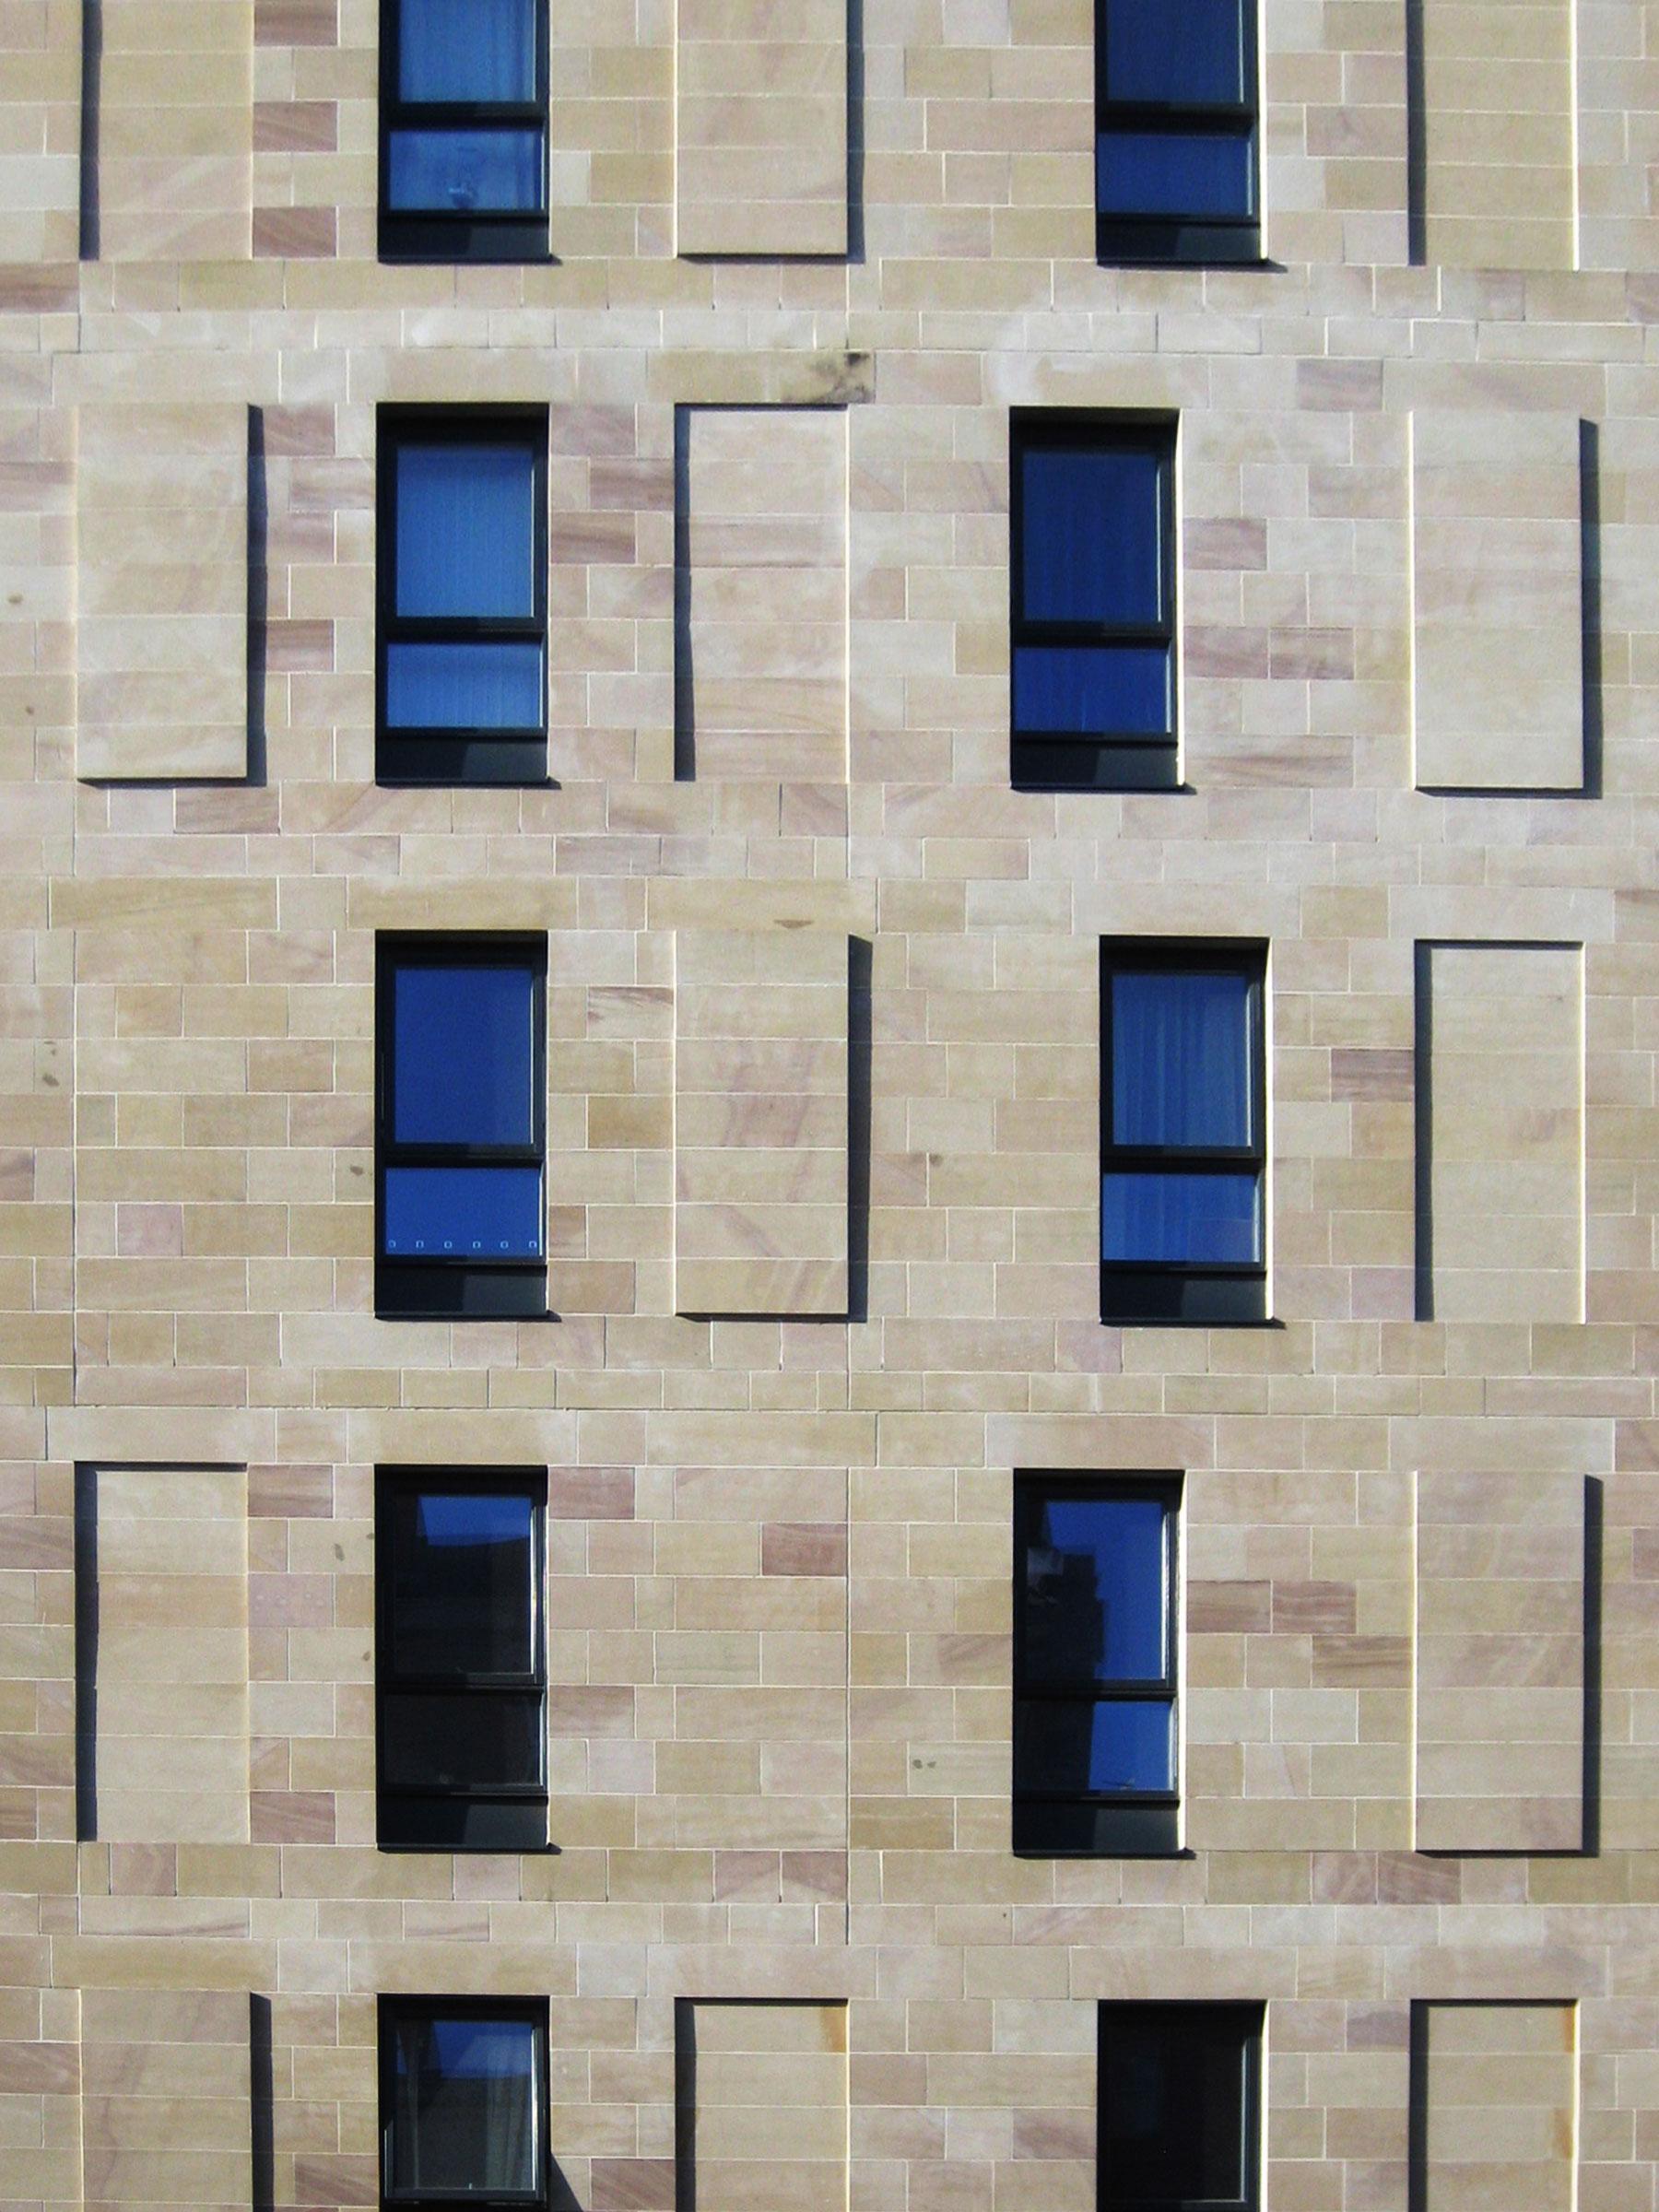 Resonant Architecture / AB+C Architects Glasgow housing